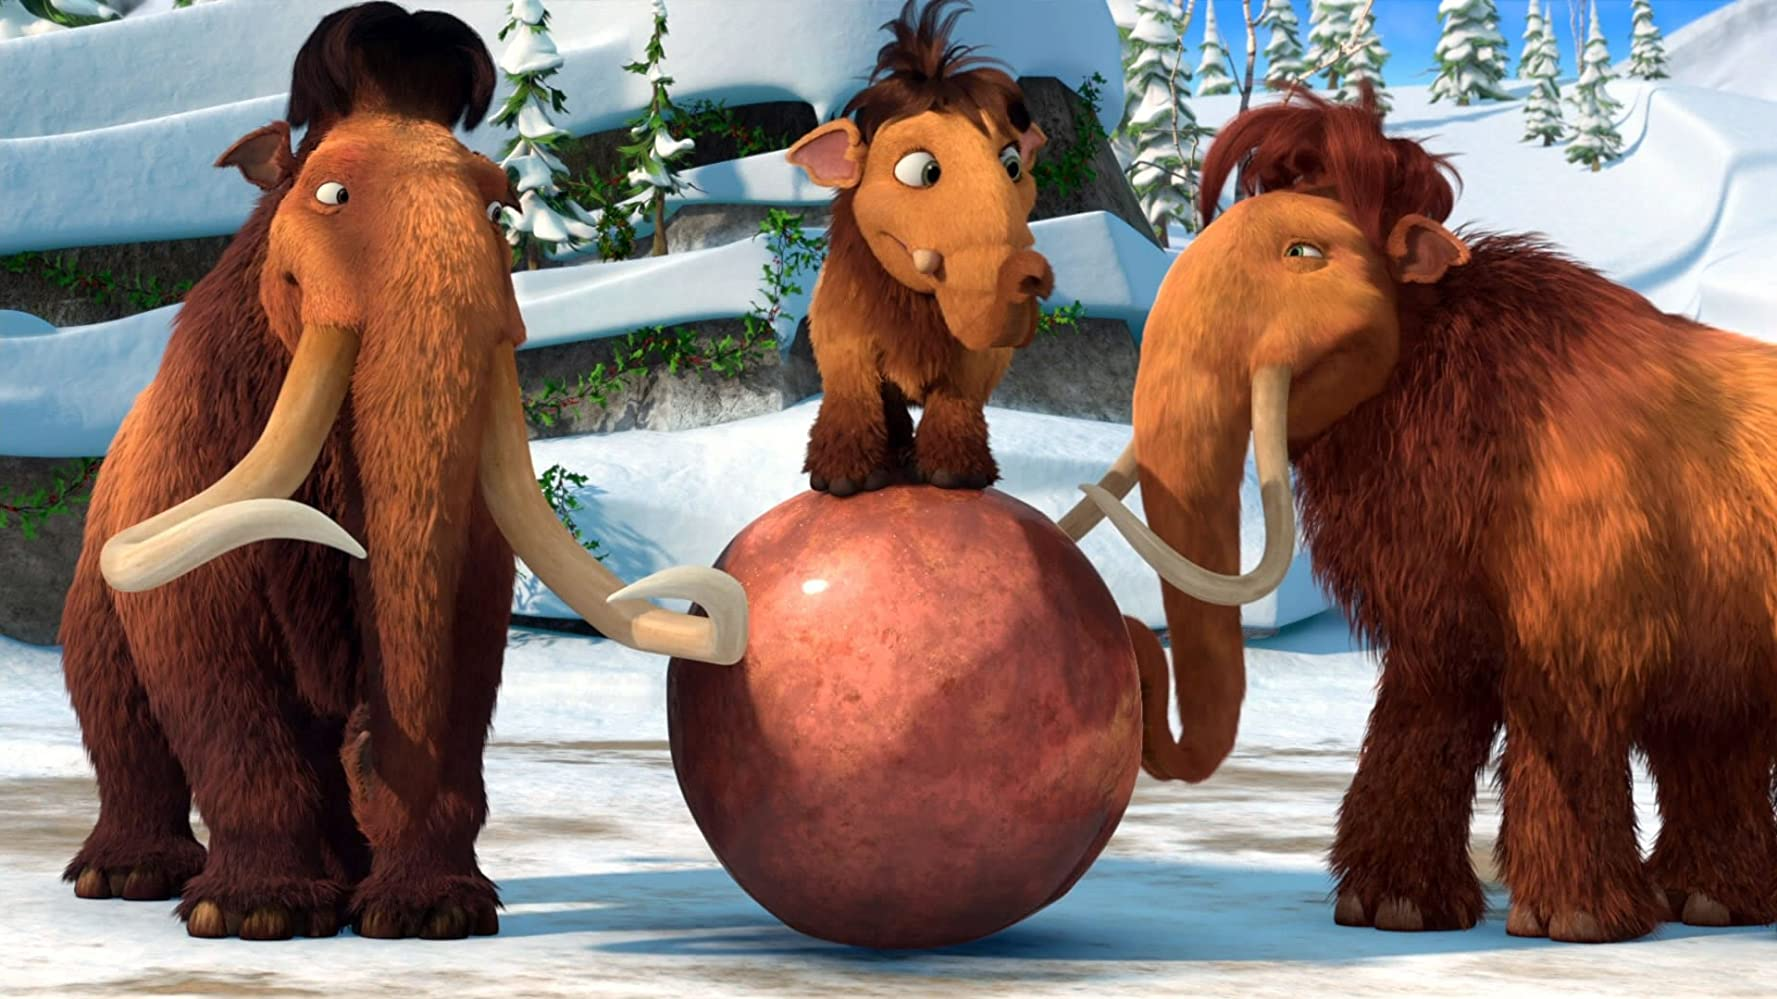 ice age a mammoth christmas 2011 - Ice Age Mammoth Christmas